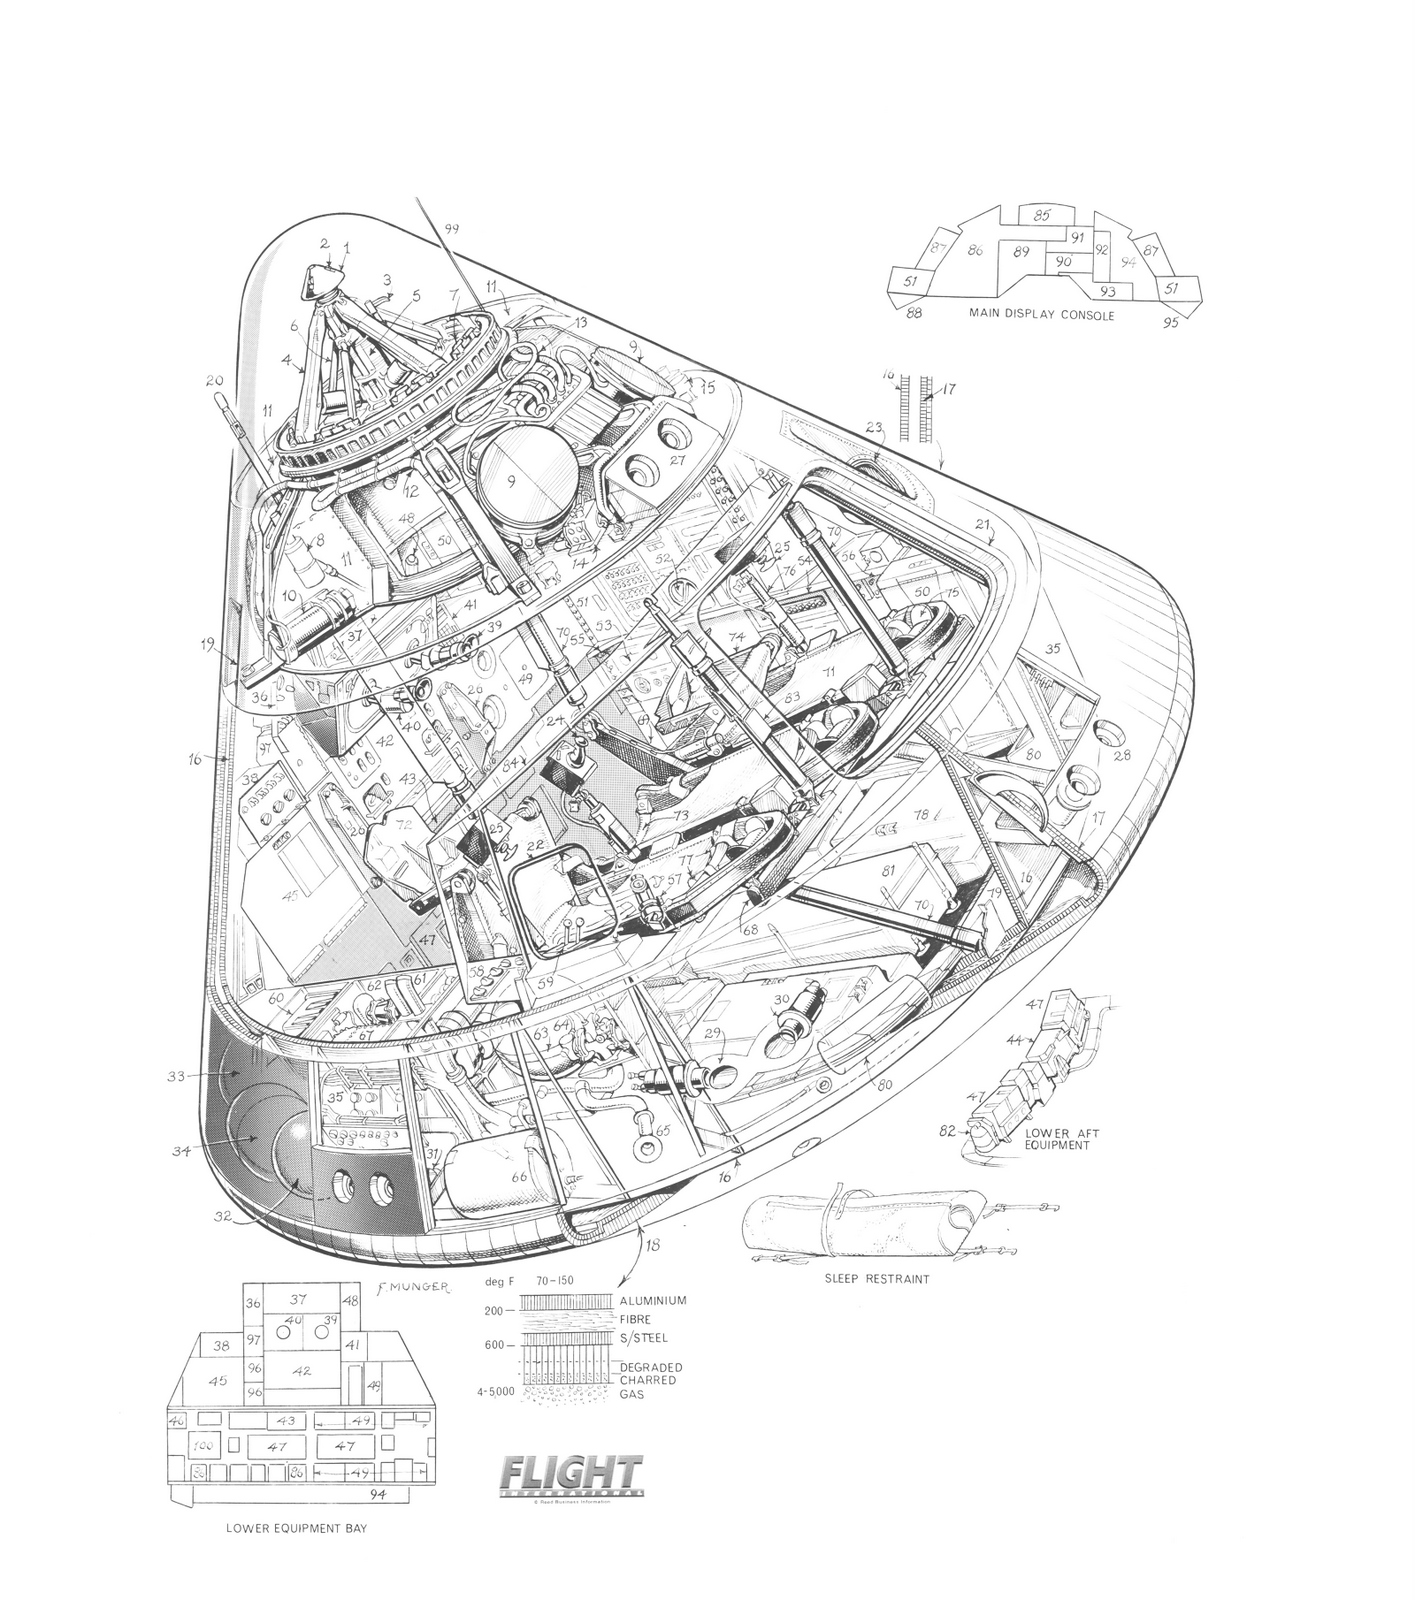 Lunar Landing Module Drawings - Pics about space